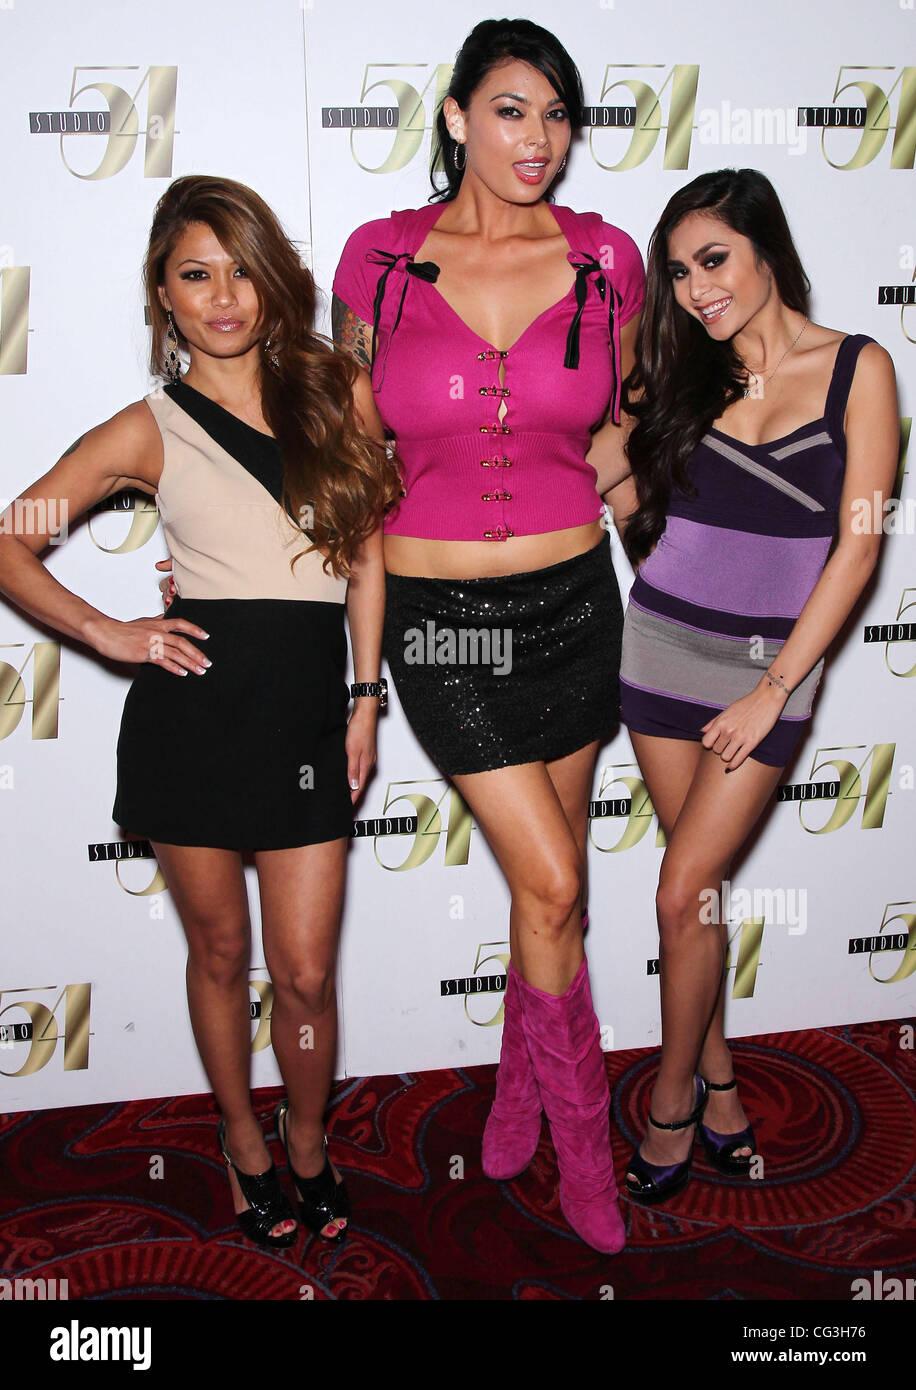 Charmane Star Tera Patrick Michelle Maylene Adult Video Star Tera Patrick Hosts Vegas